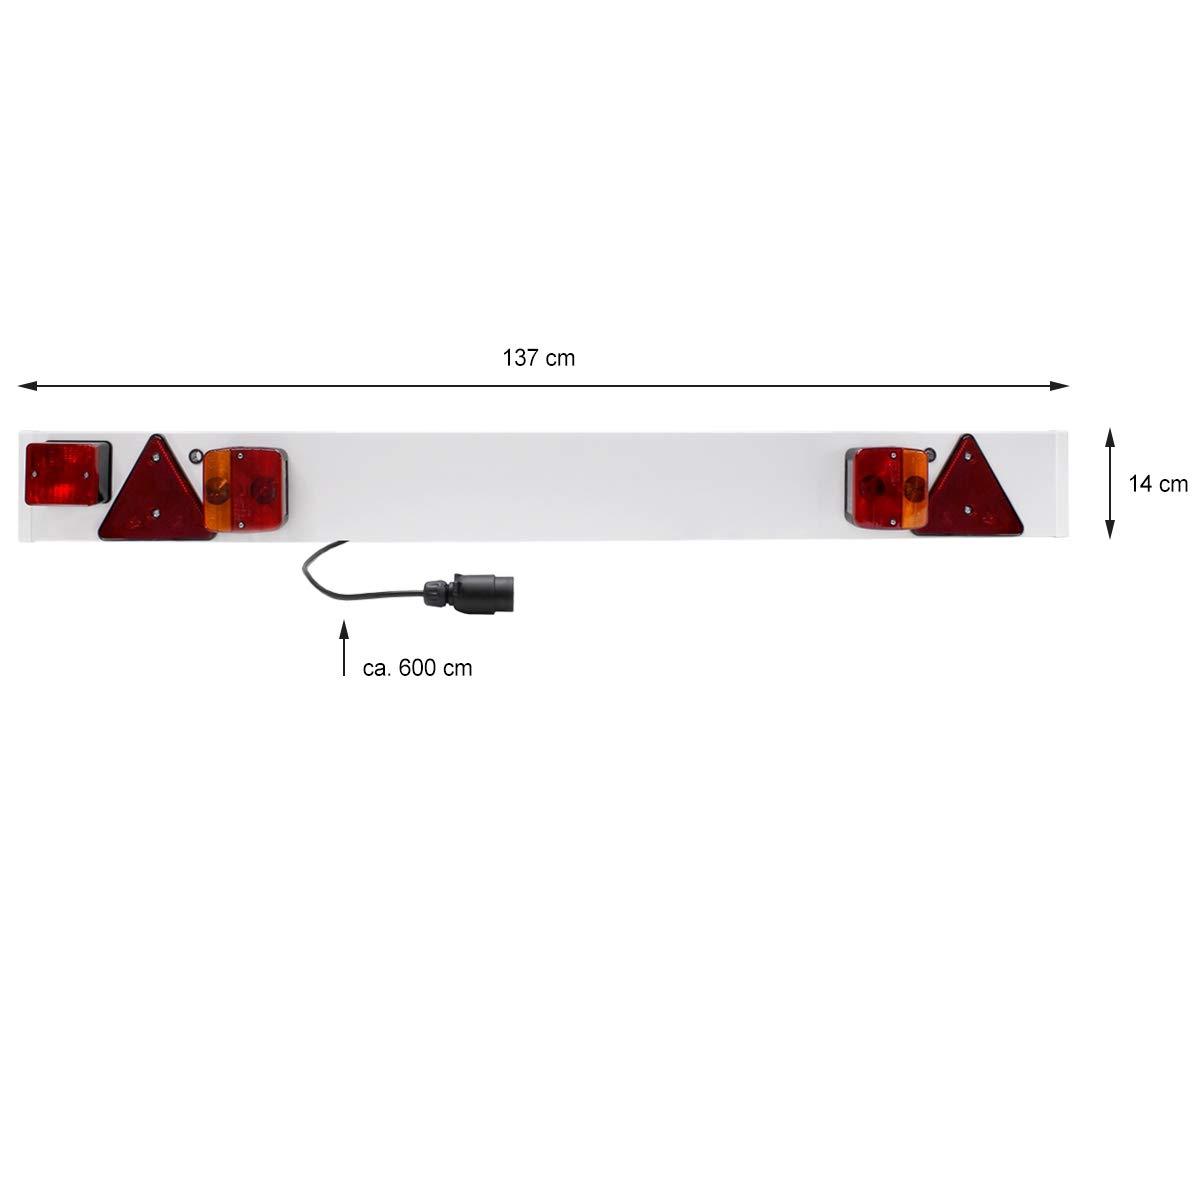 ECD Germany Barras de iluminación para Remolque Conexión con 7 Pines Listo para conectar 12 V Luces traseras para Remolque: Amazon.es: Coche y moto